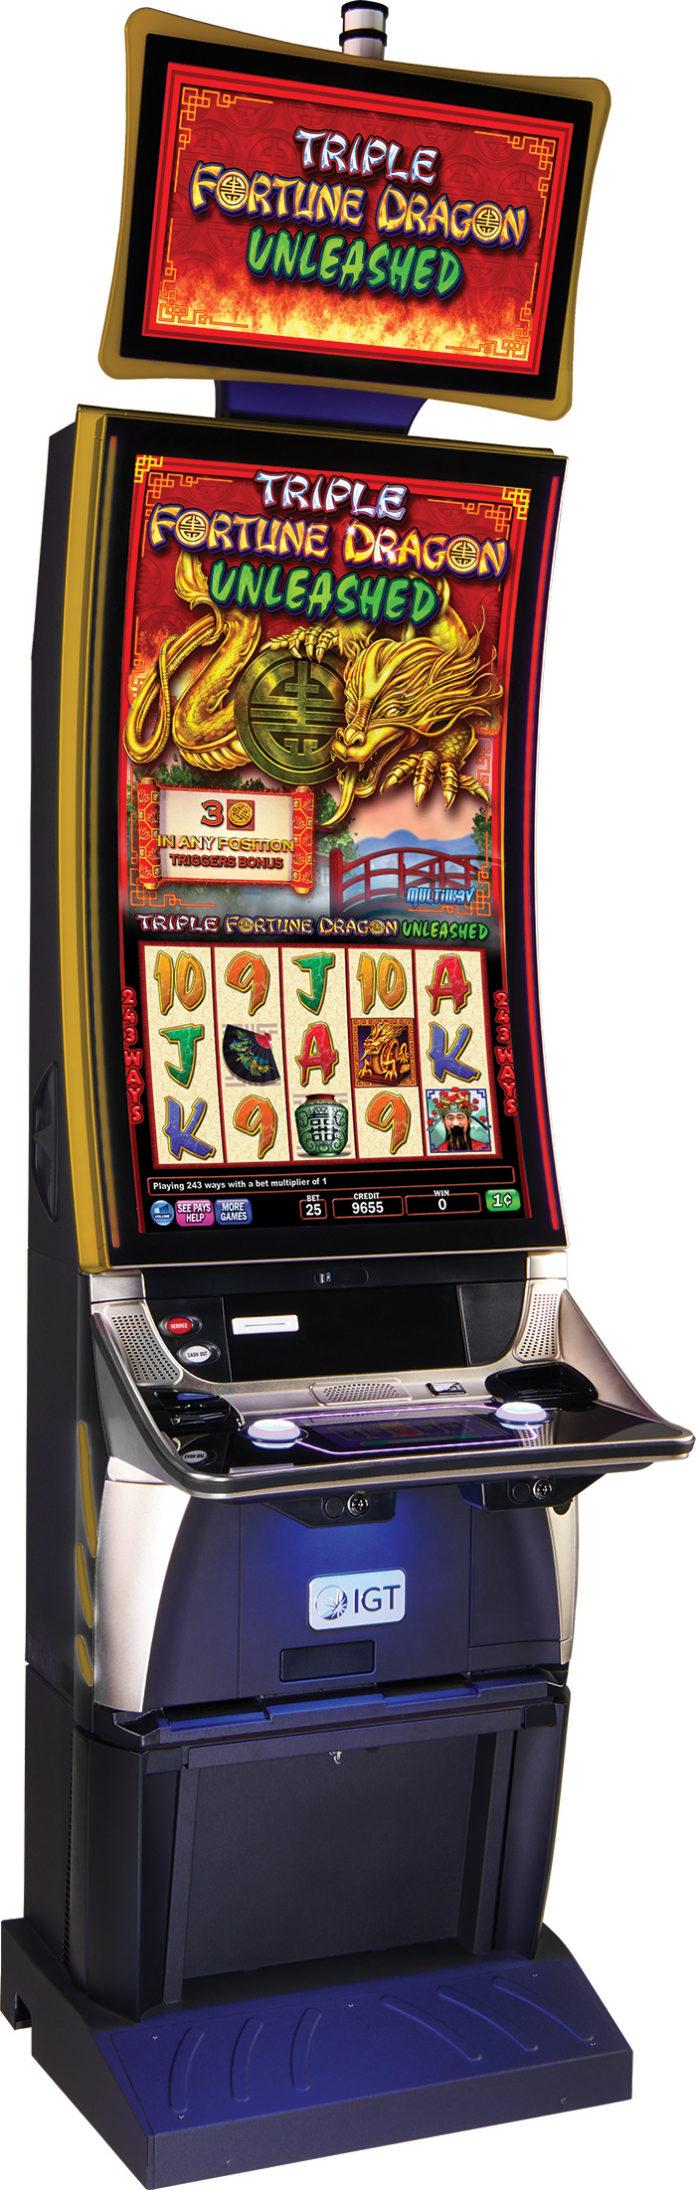 IGT Triple Fortune Dragon Unleashed Bingo